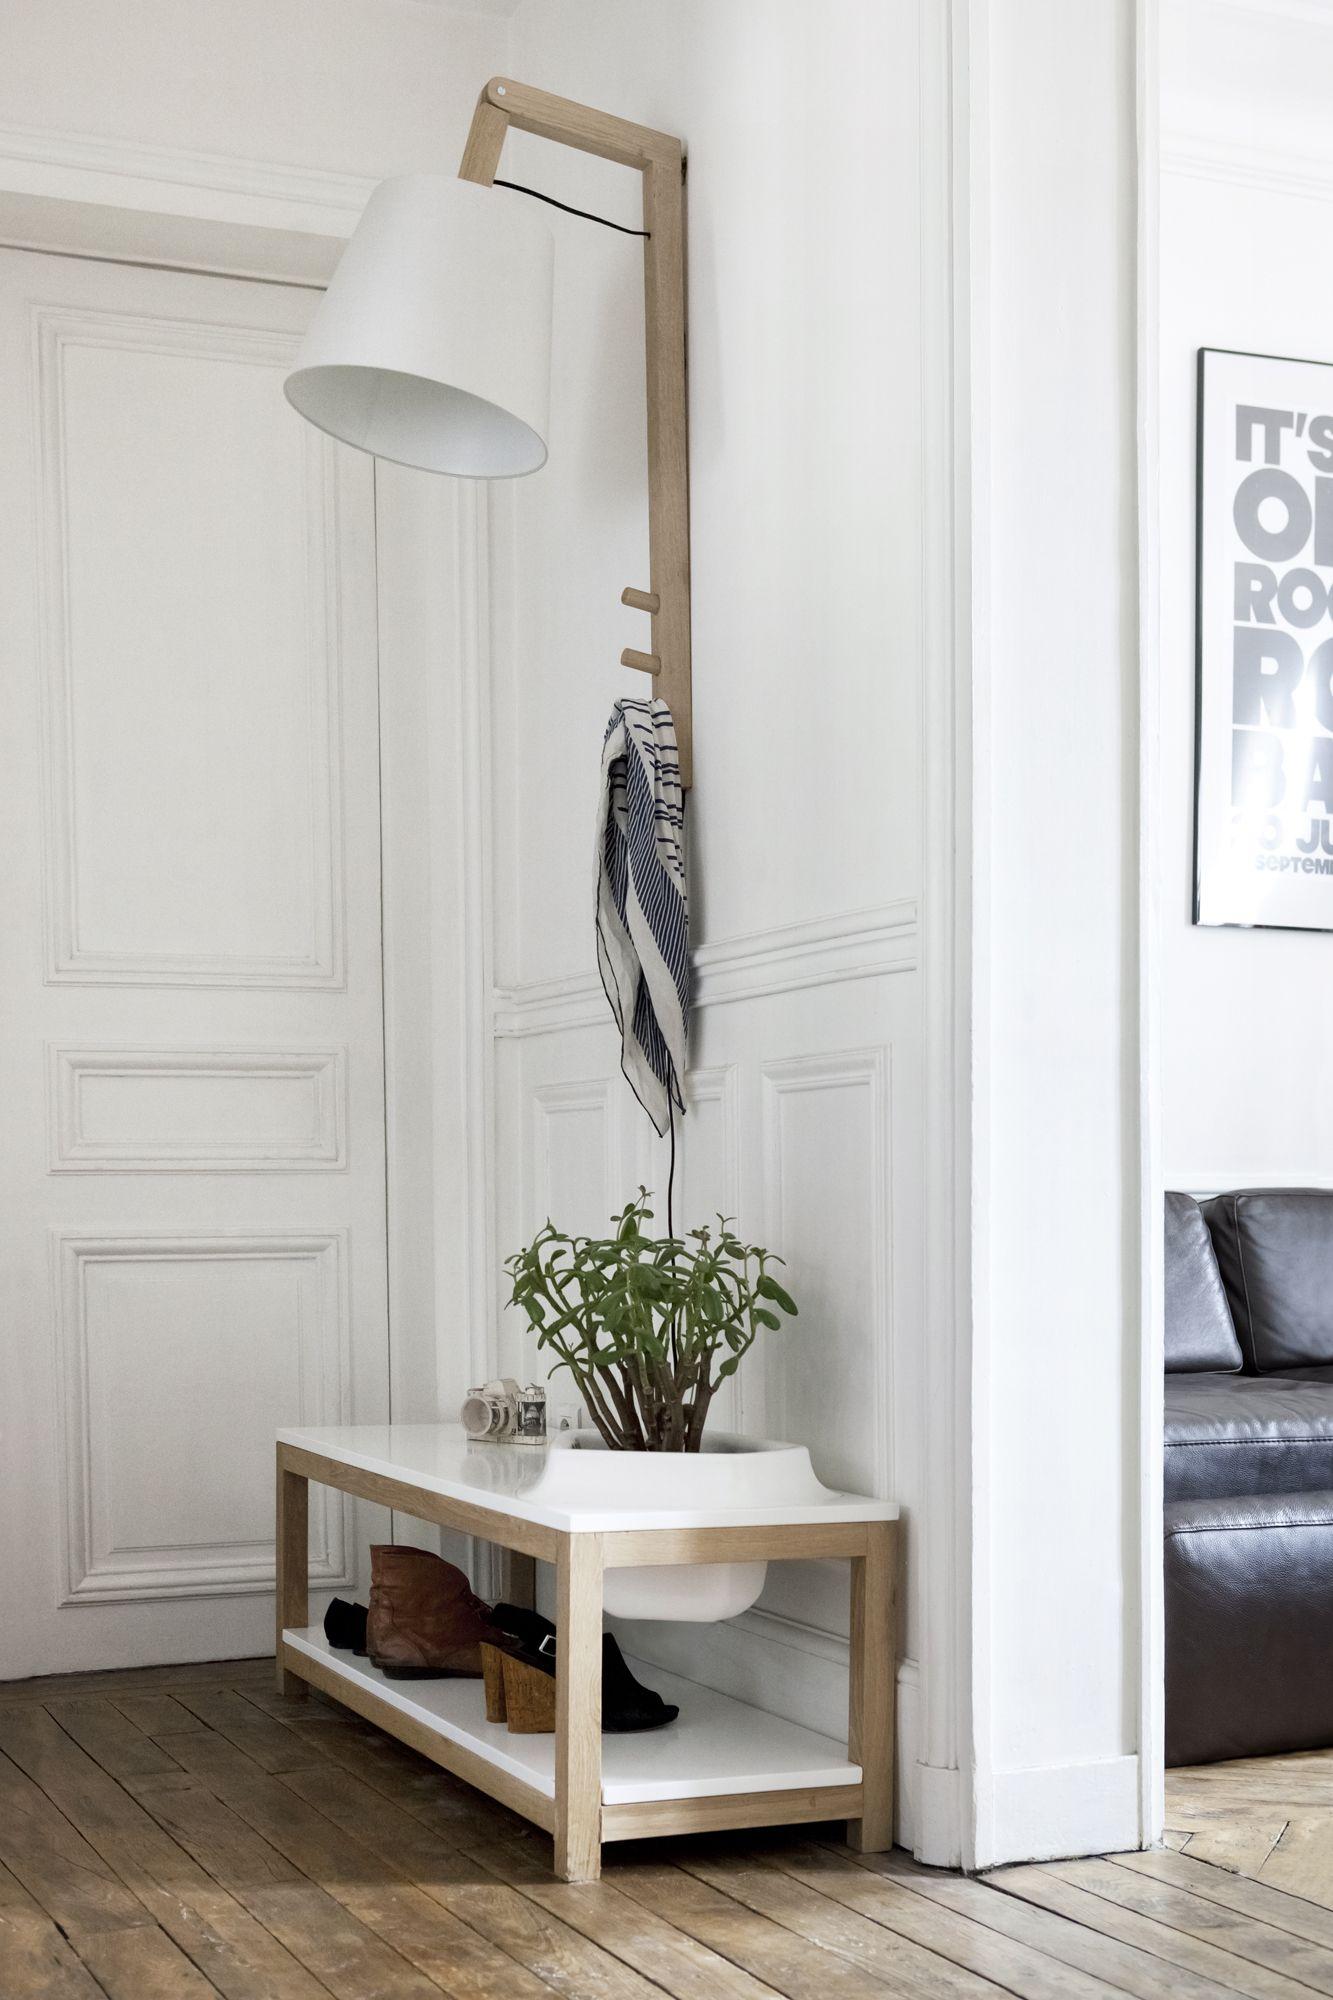 lampe de sol tendance en tiges de bambou naturel h 50 ou. Black Bedroom Furniture Sets. Home Design Ideas